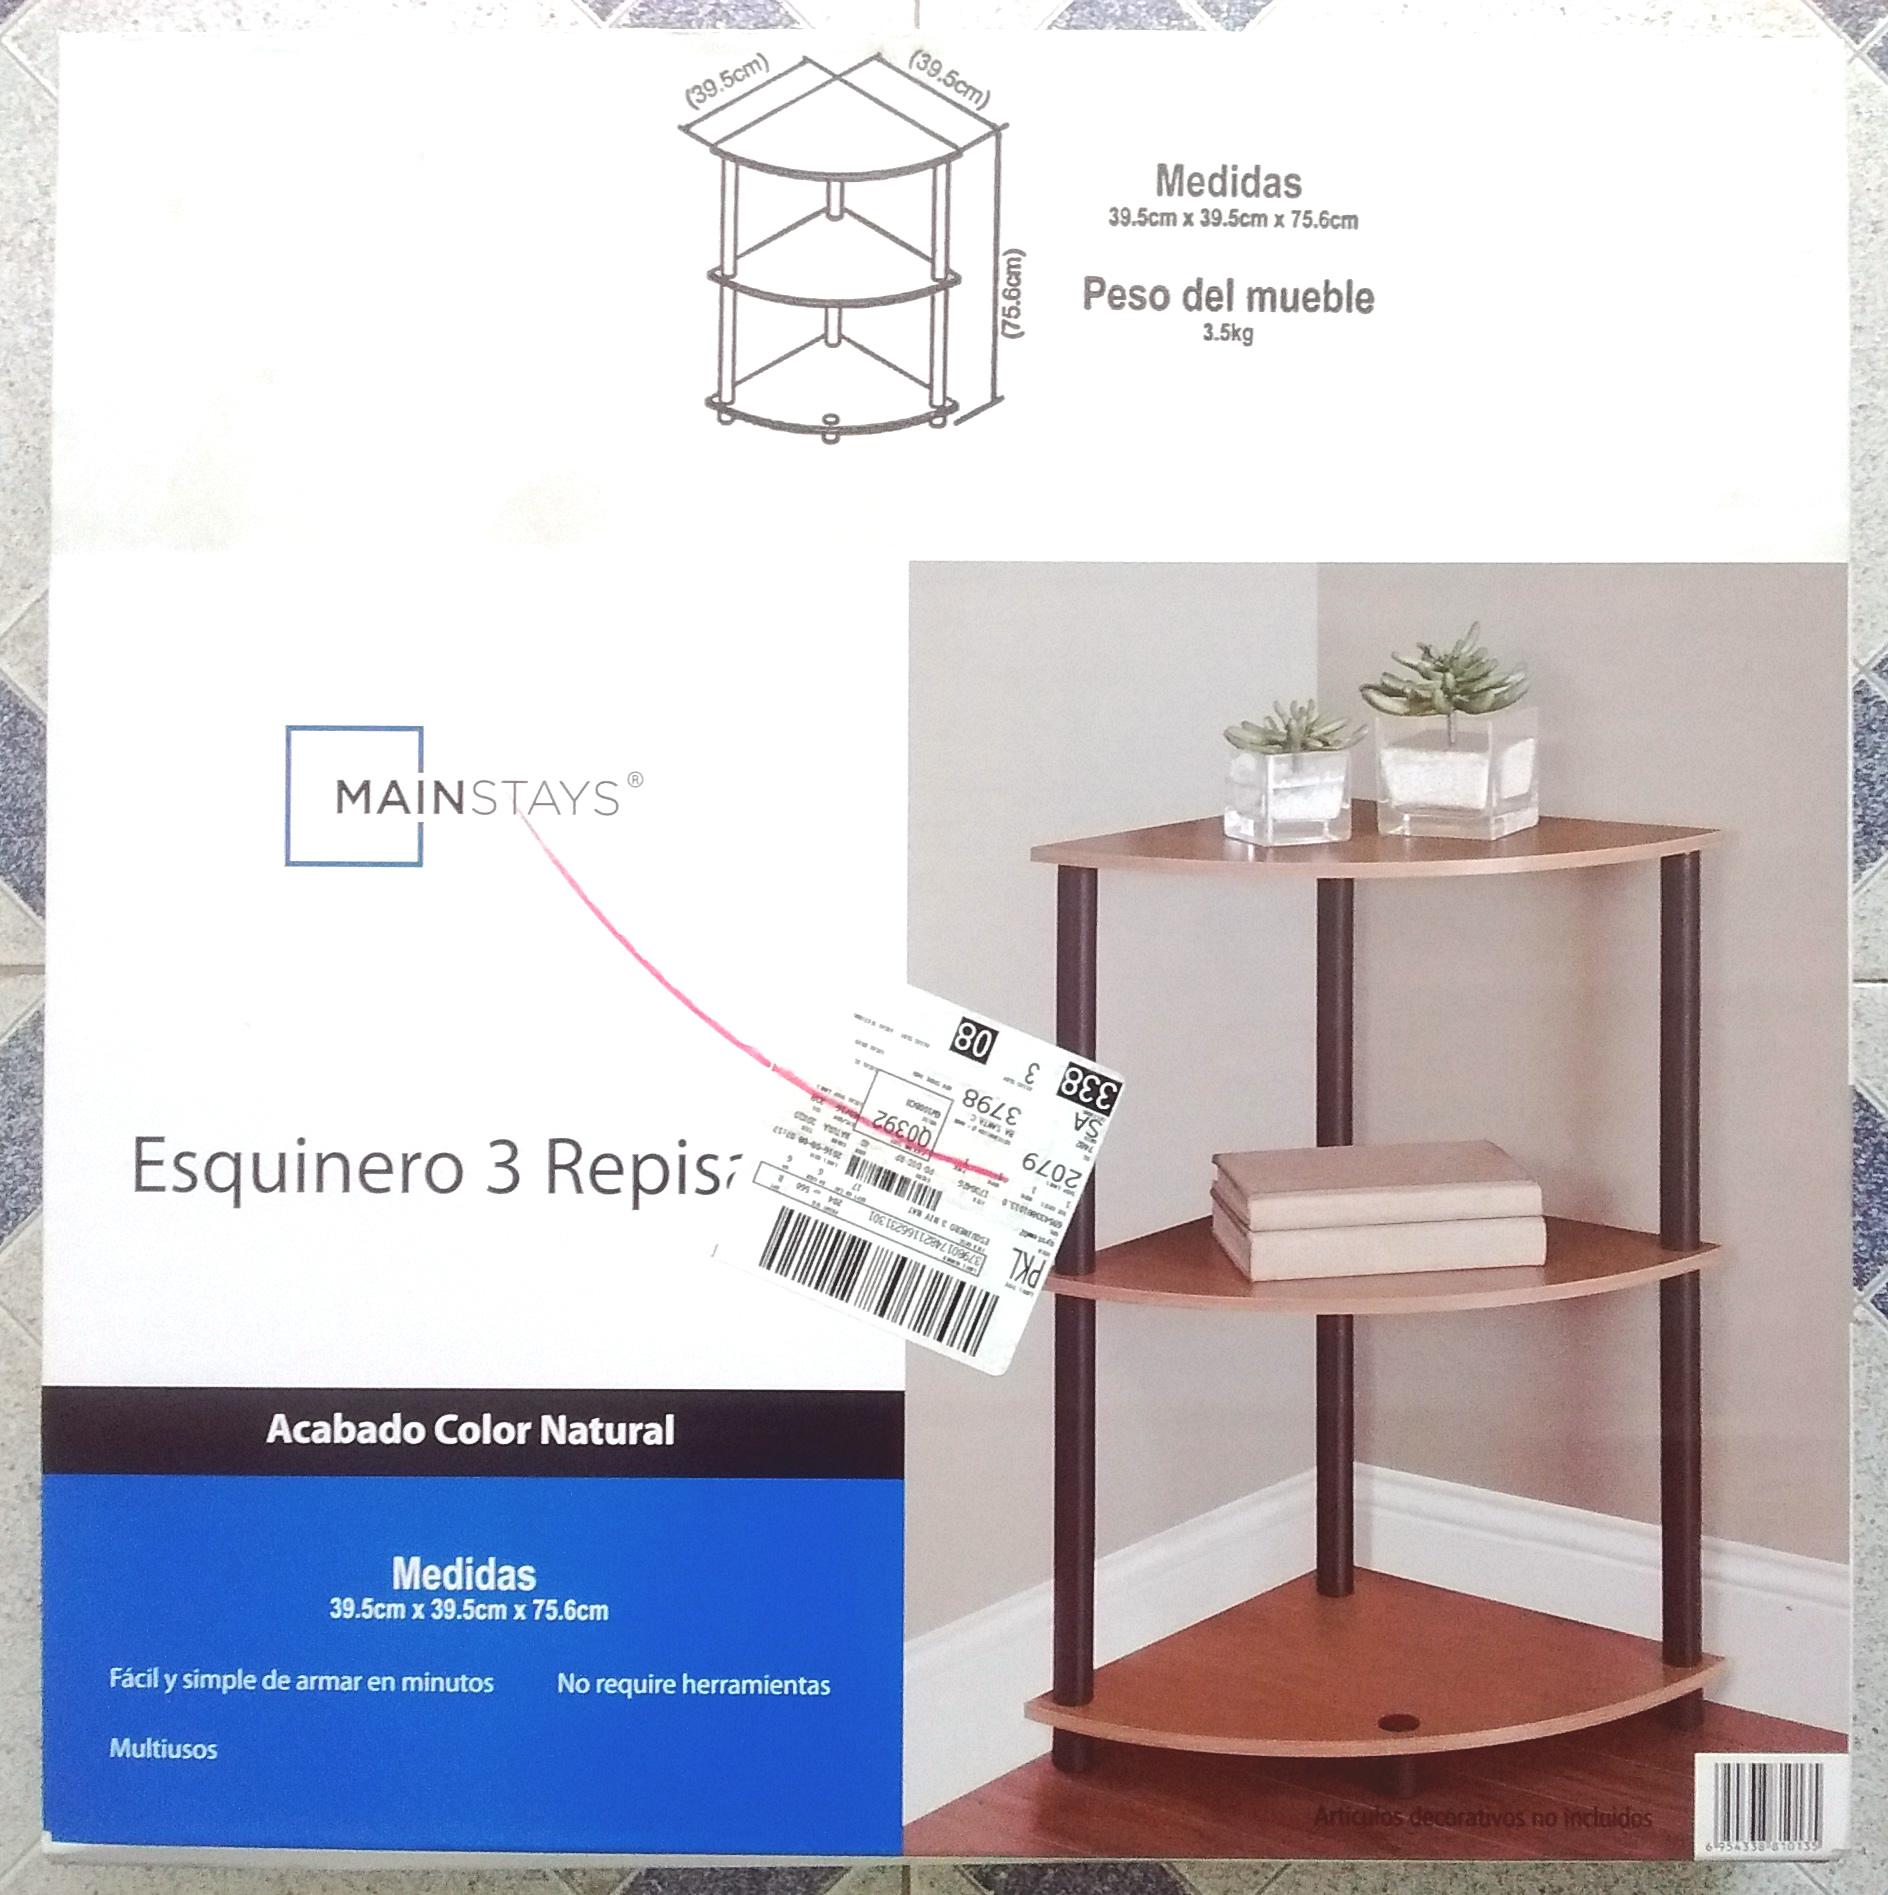 Bodega Aurrerá: Esquinero con 3 Repisas Mainstays - promodescuentos.com